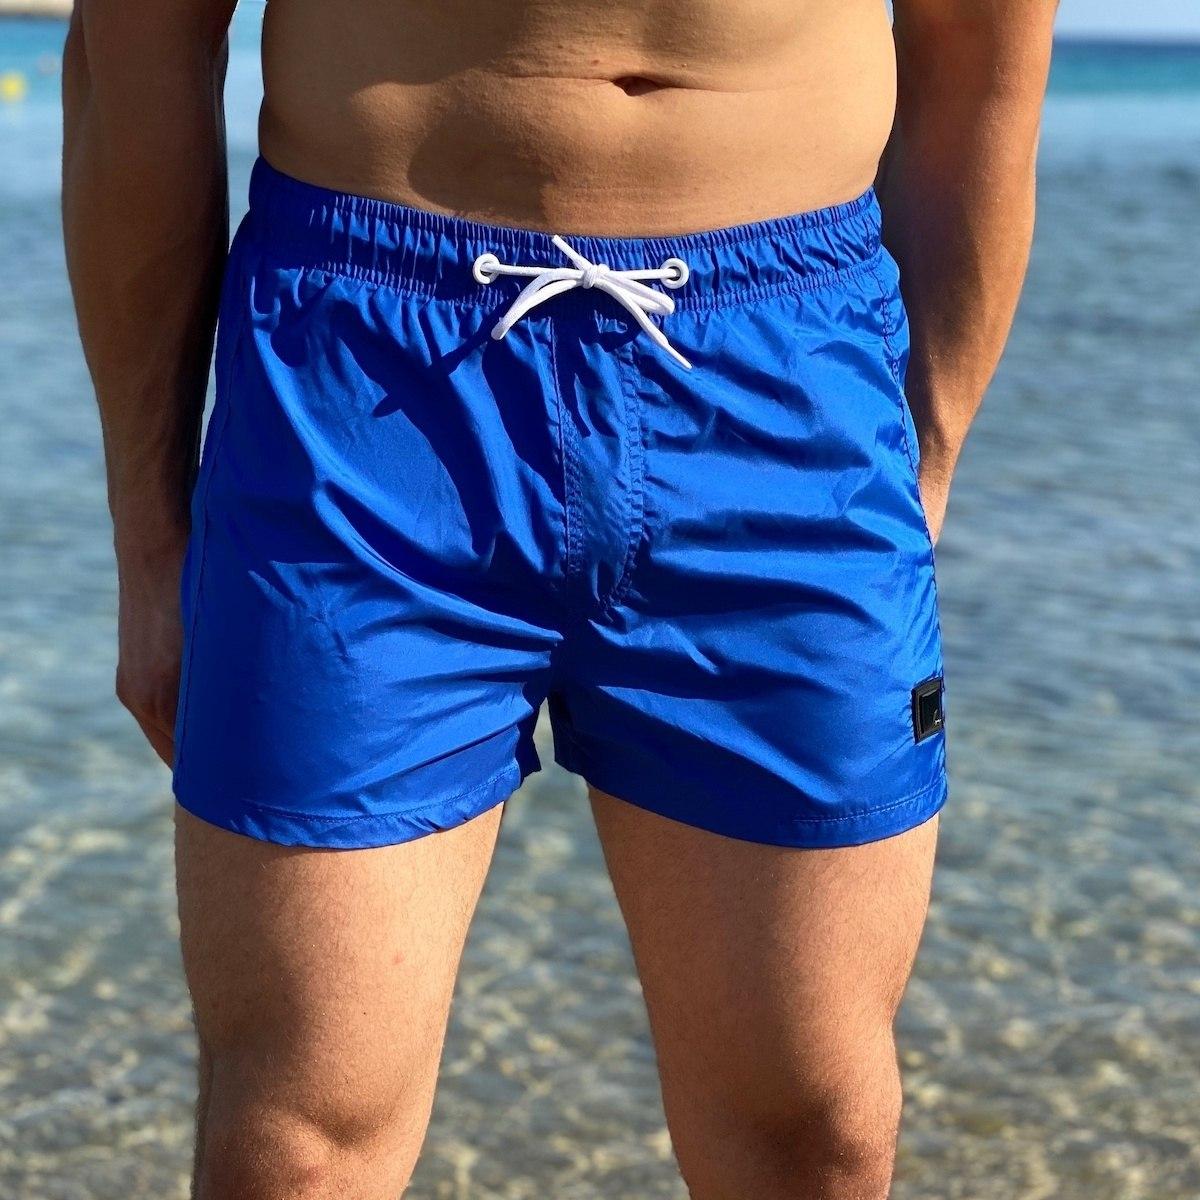 Men's Swimming Short In...